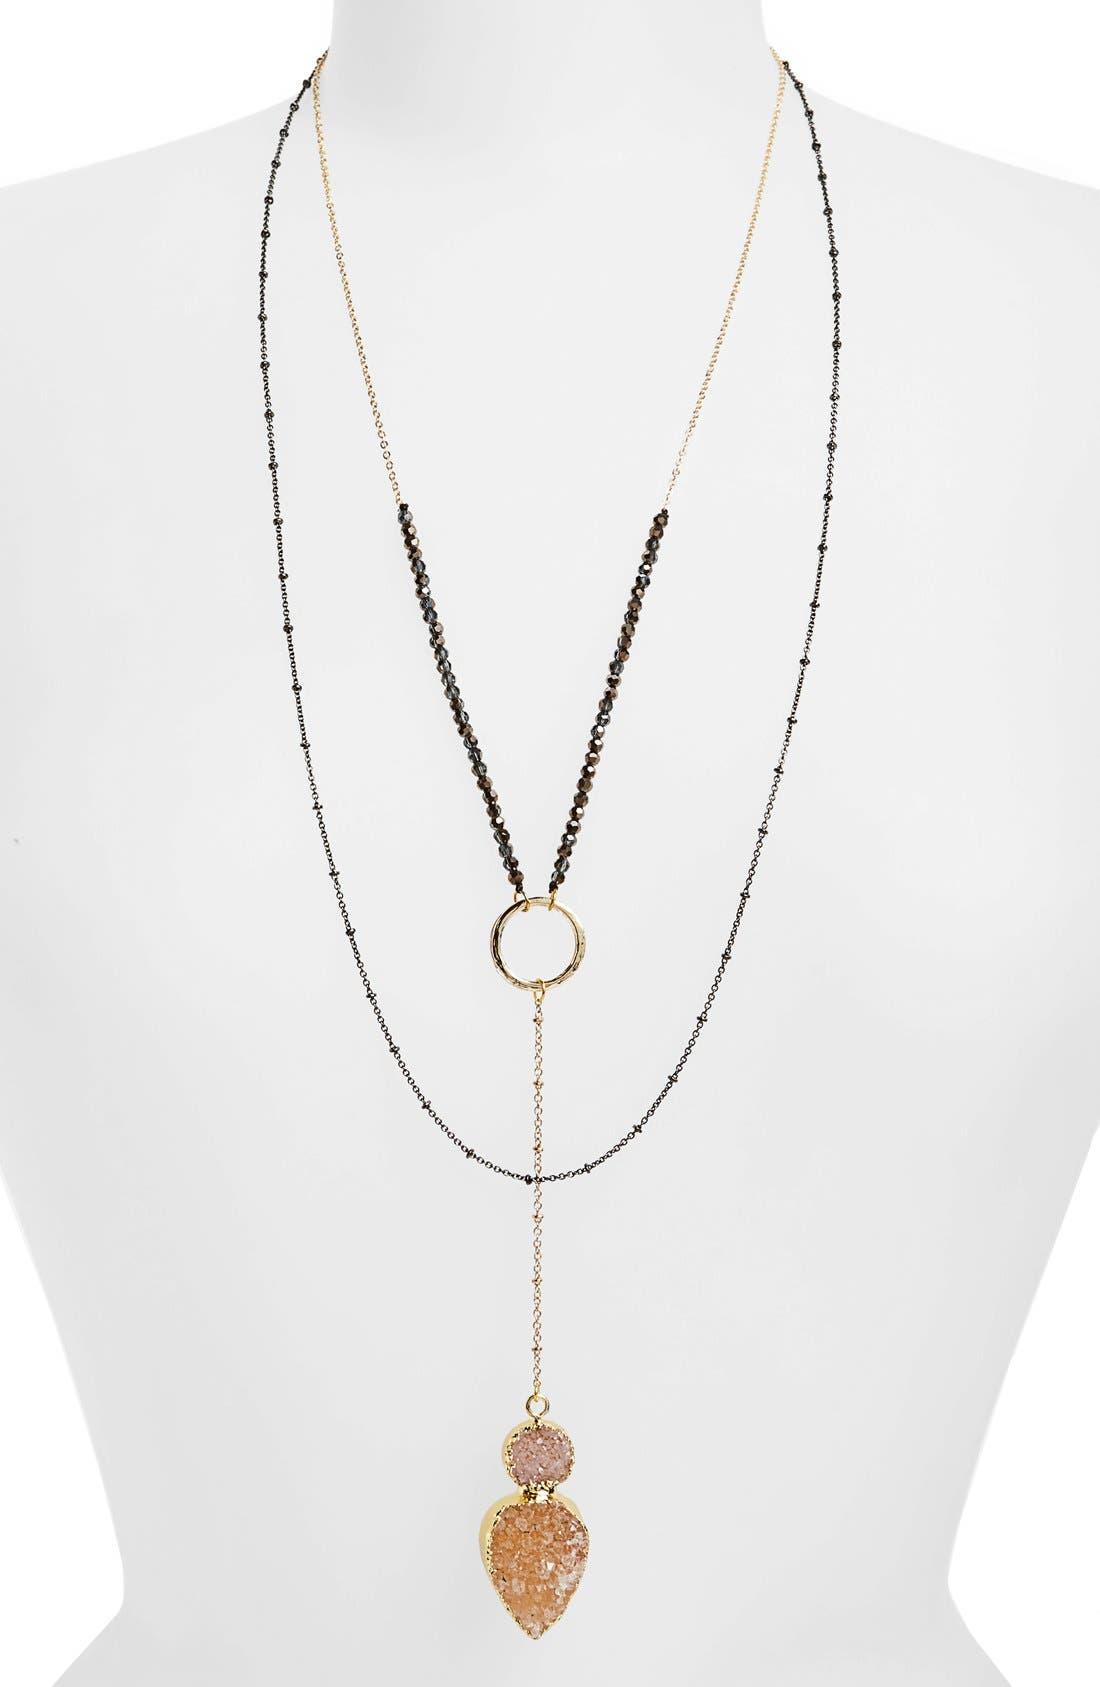 Main Image - Panacea Layered Pendant Necklace